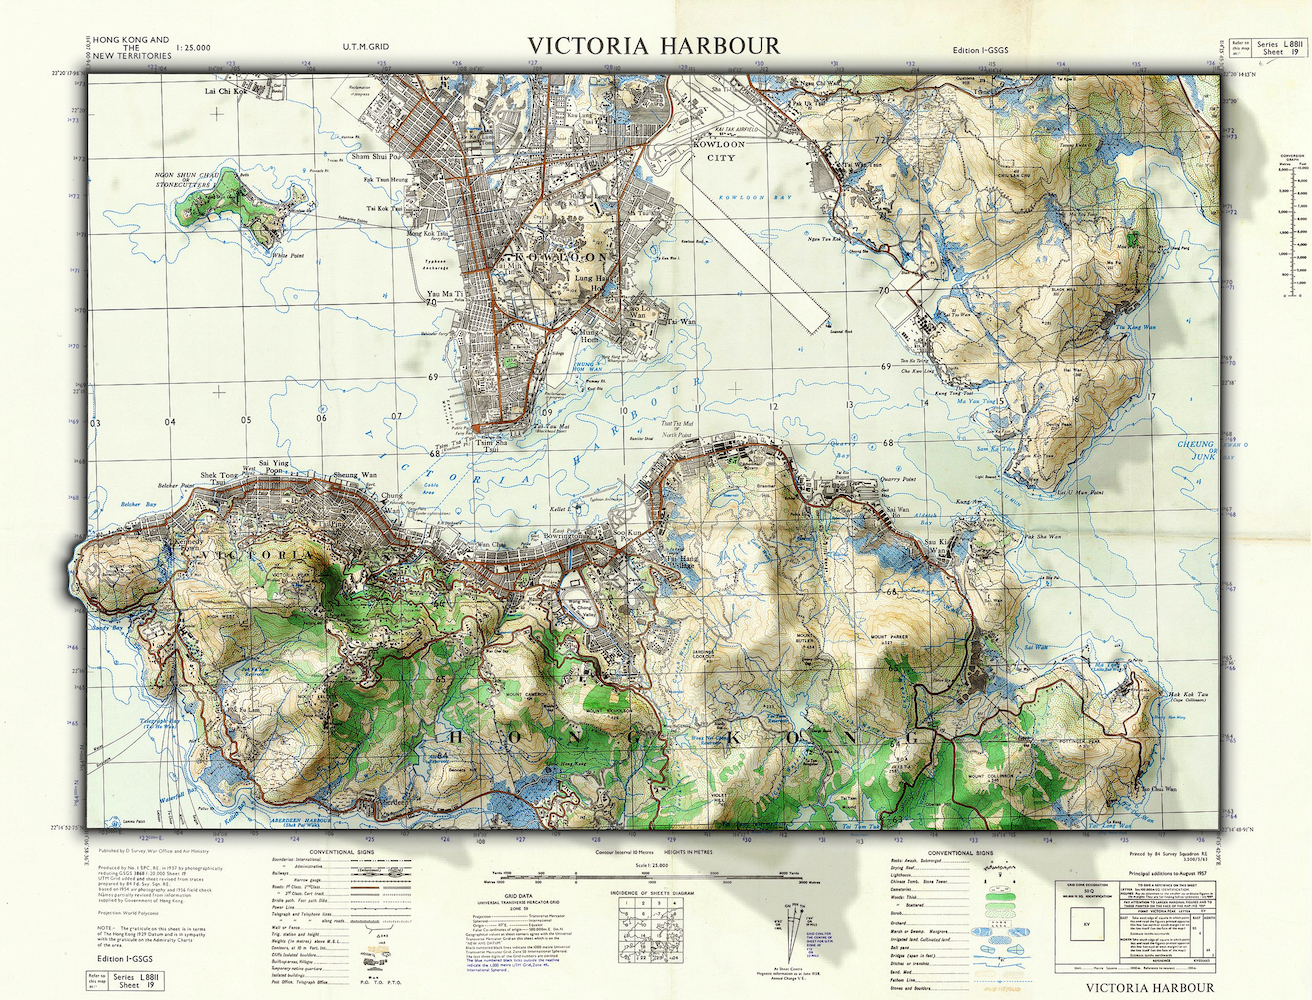 2021-06-3d-topo-map-notes/vintage-map-optsize.jpg